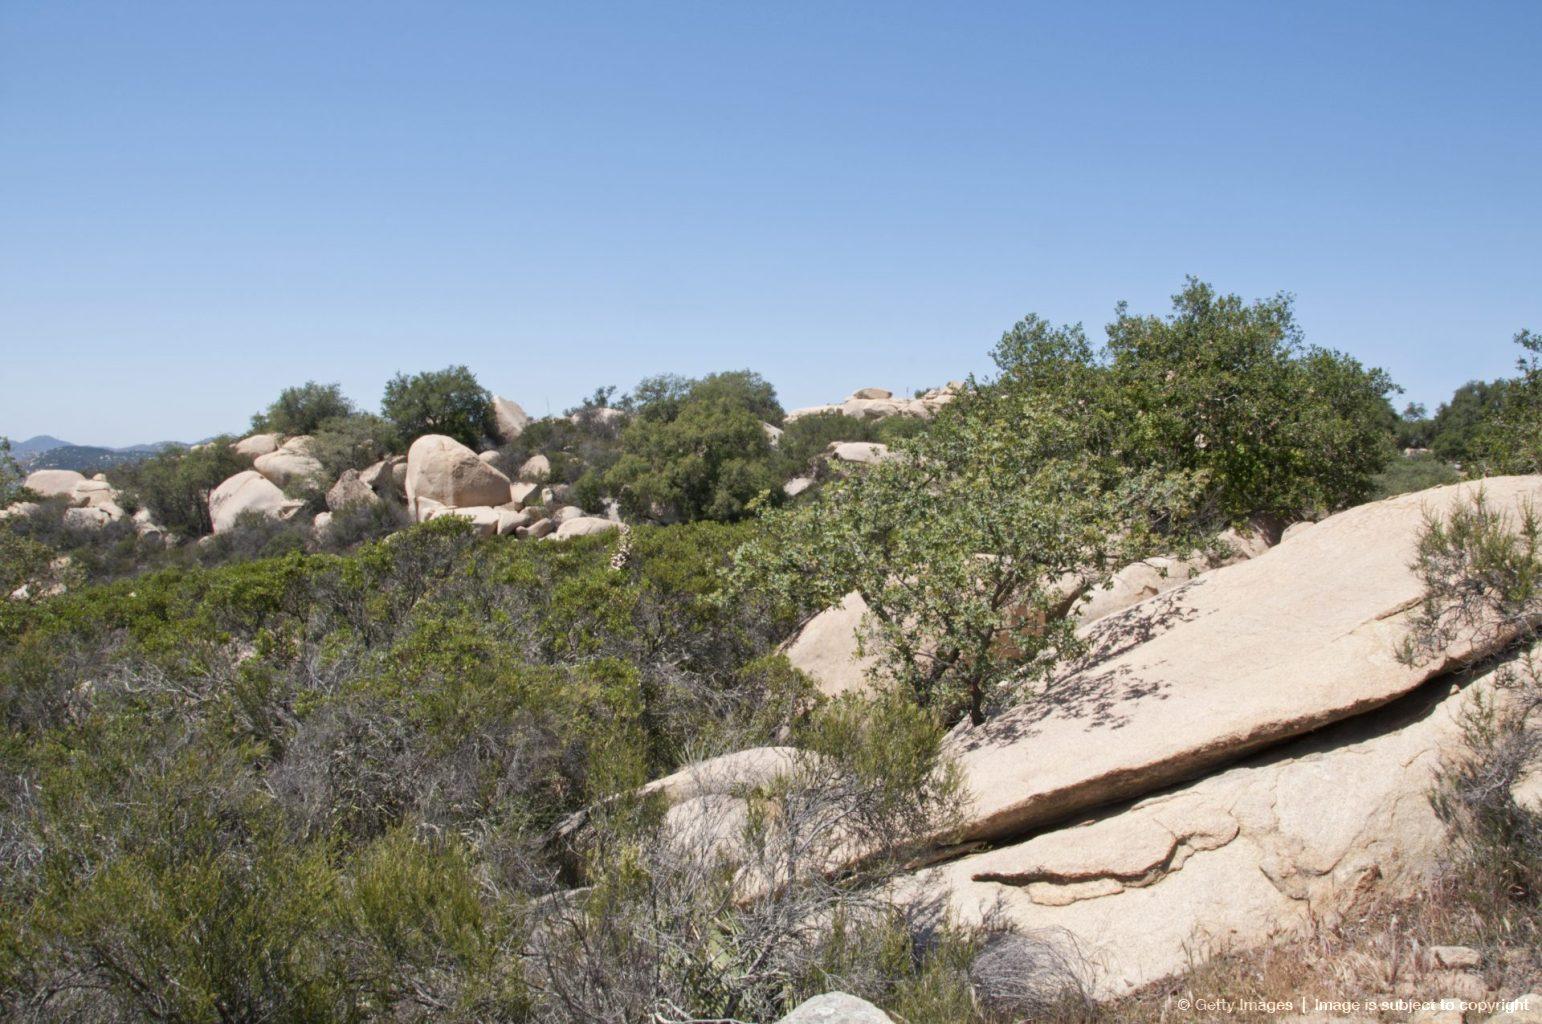 coastal sage scrub habitat in southern california